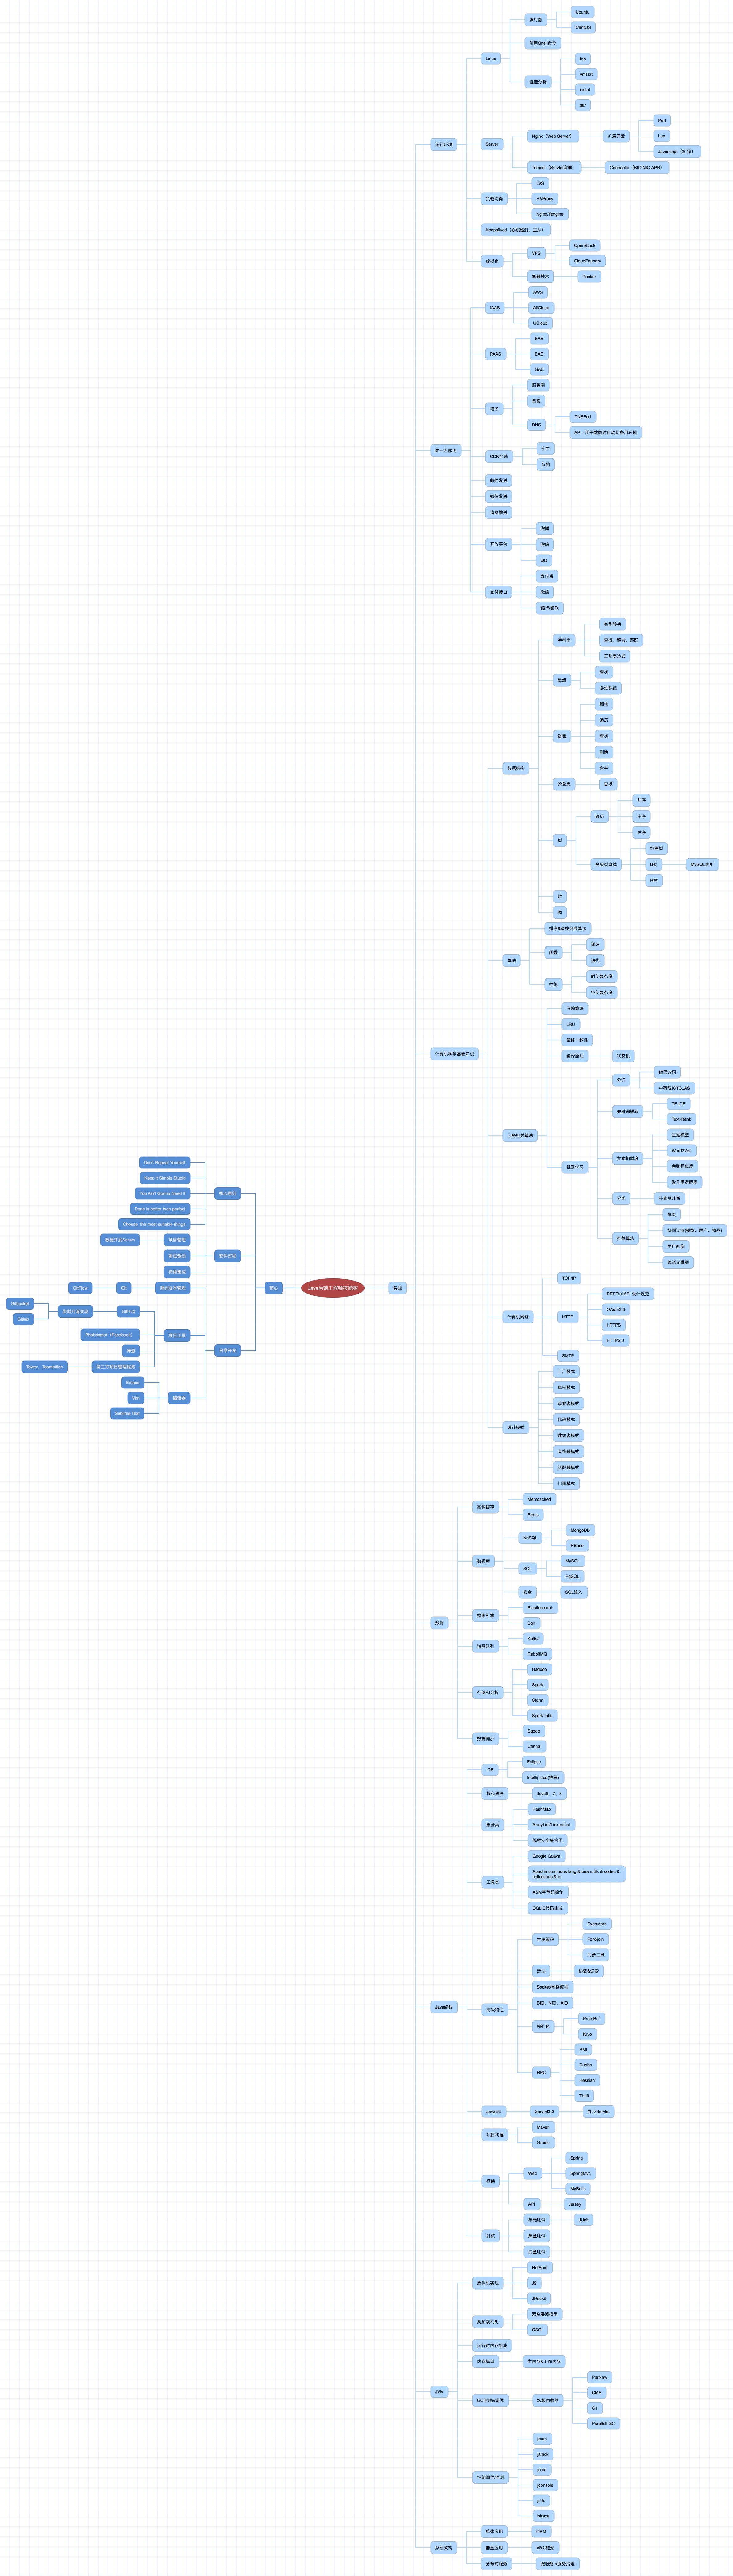 《Java后端技术概览》